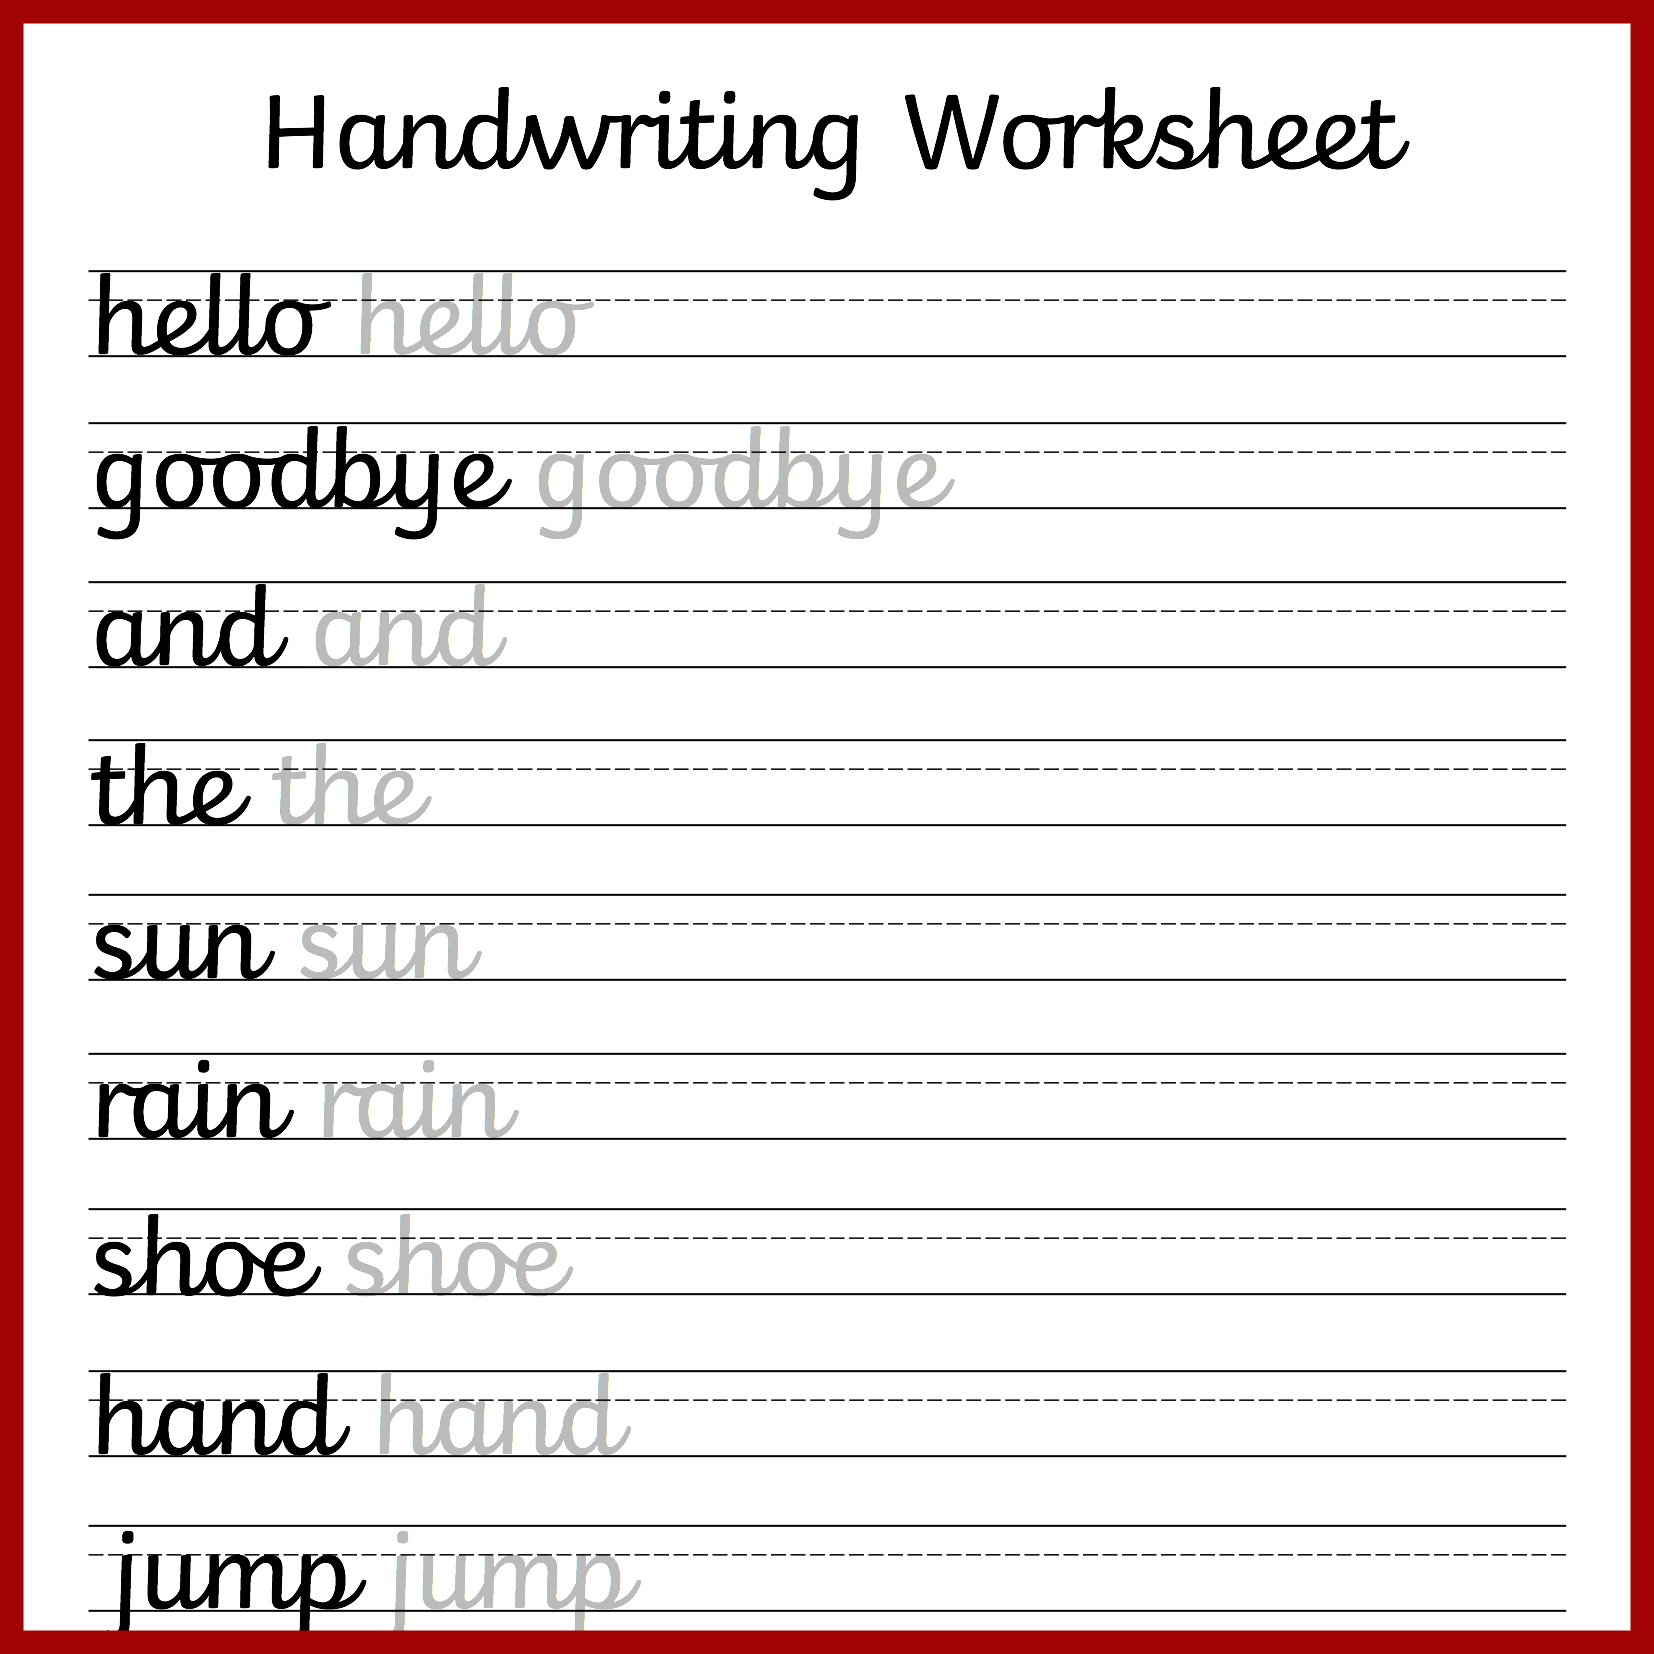 Cursive Handwriting Worksheets – Free Printable! ⋆ Mama Geek - Free | Printable Handwriting Worksheets